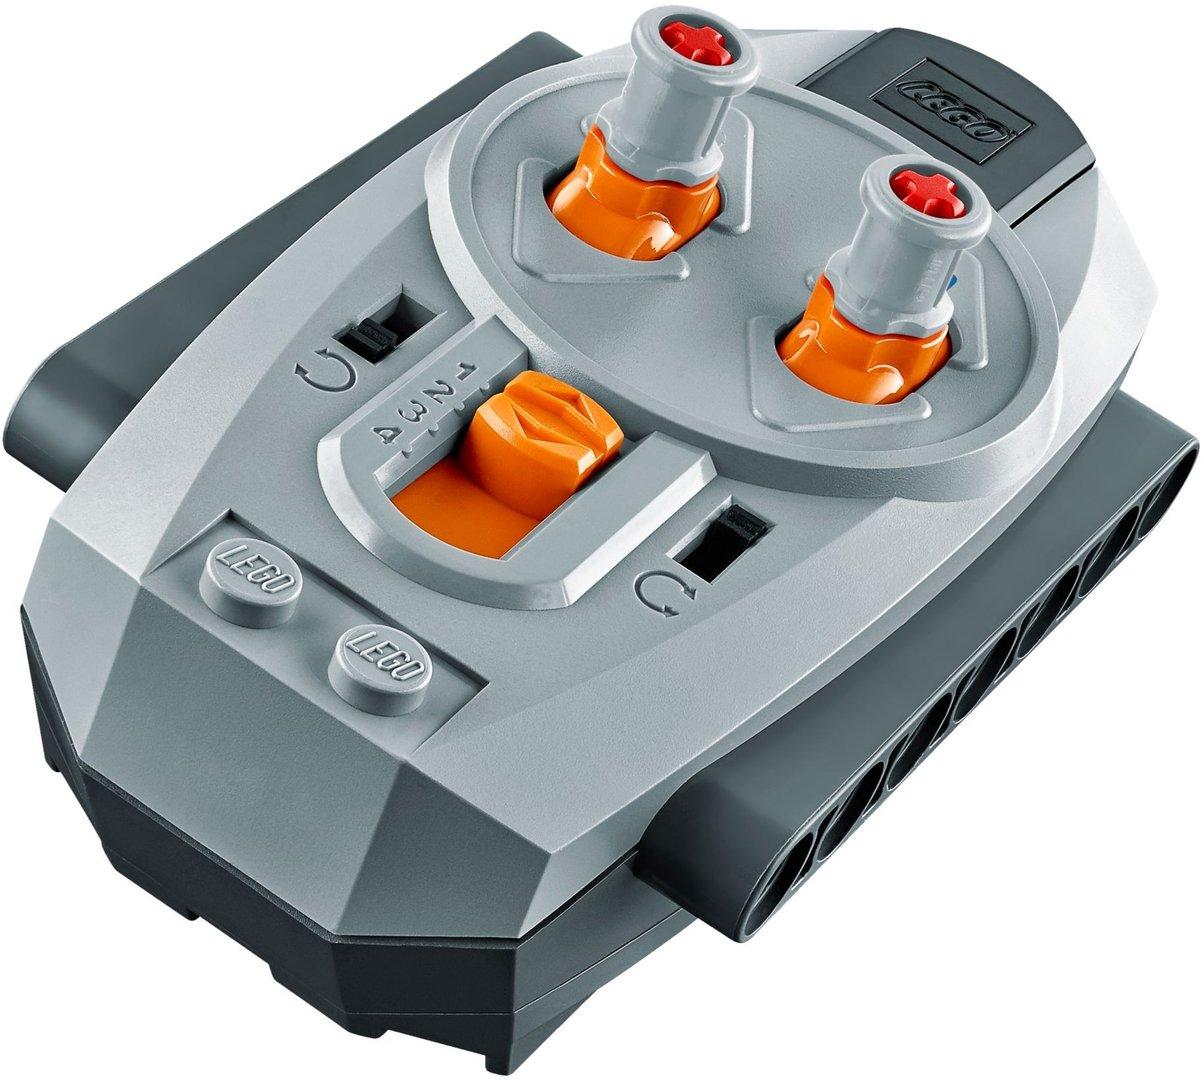 LEGO® Technic - 2 in 1 Allrad-Abschleppwagen - 42070 - Torso